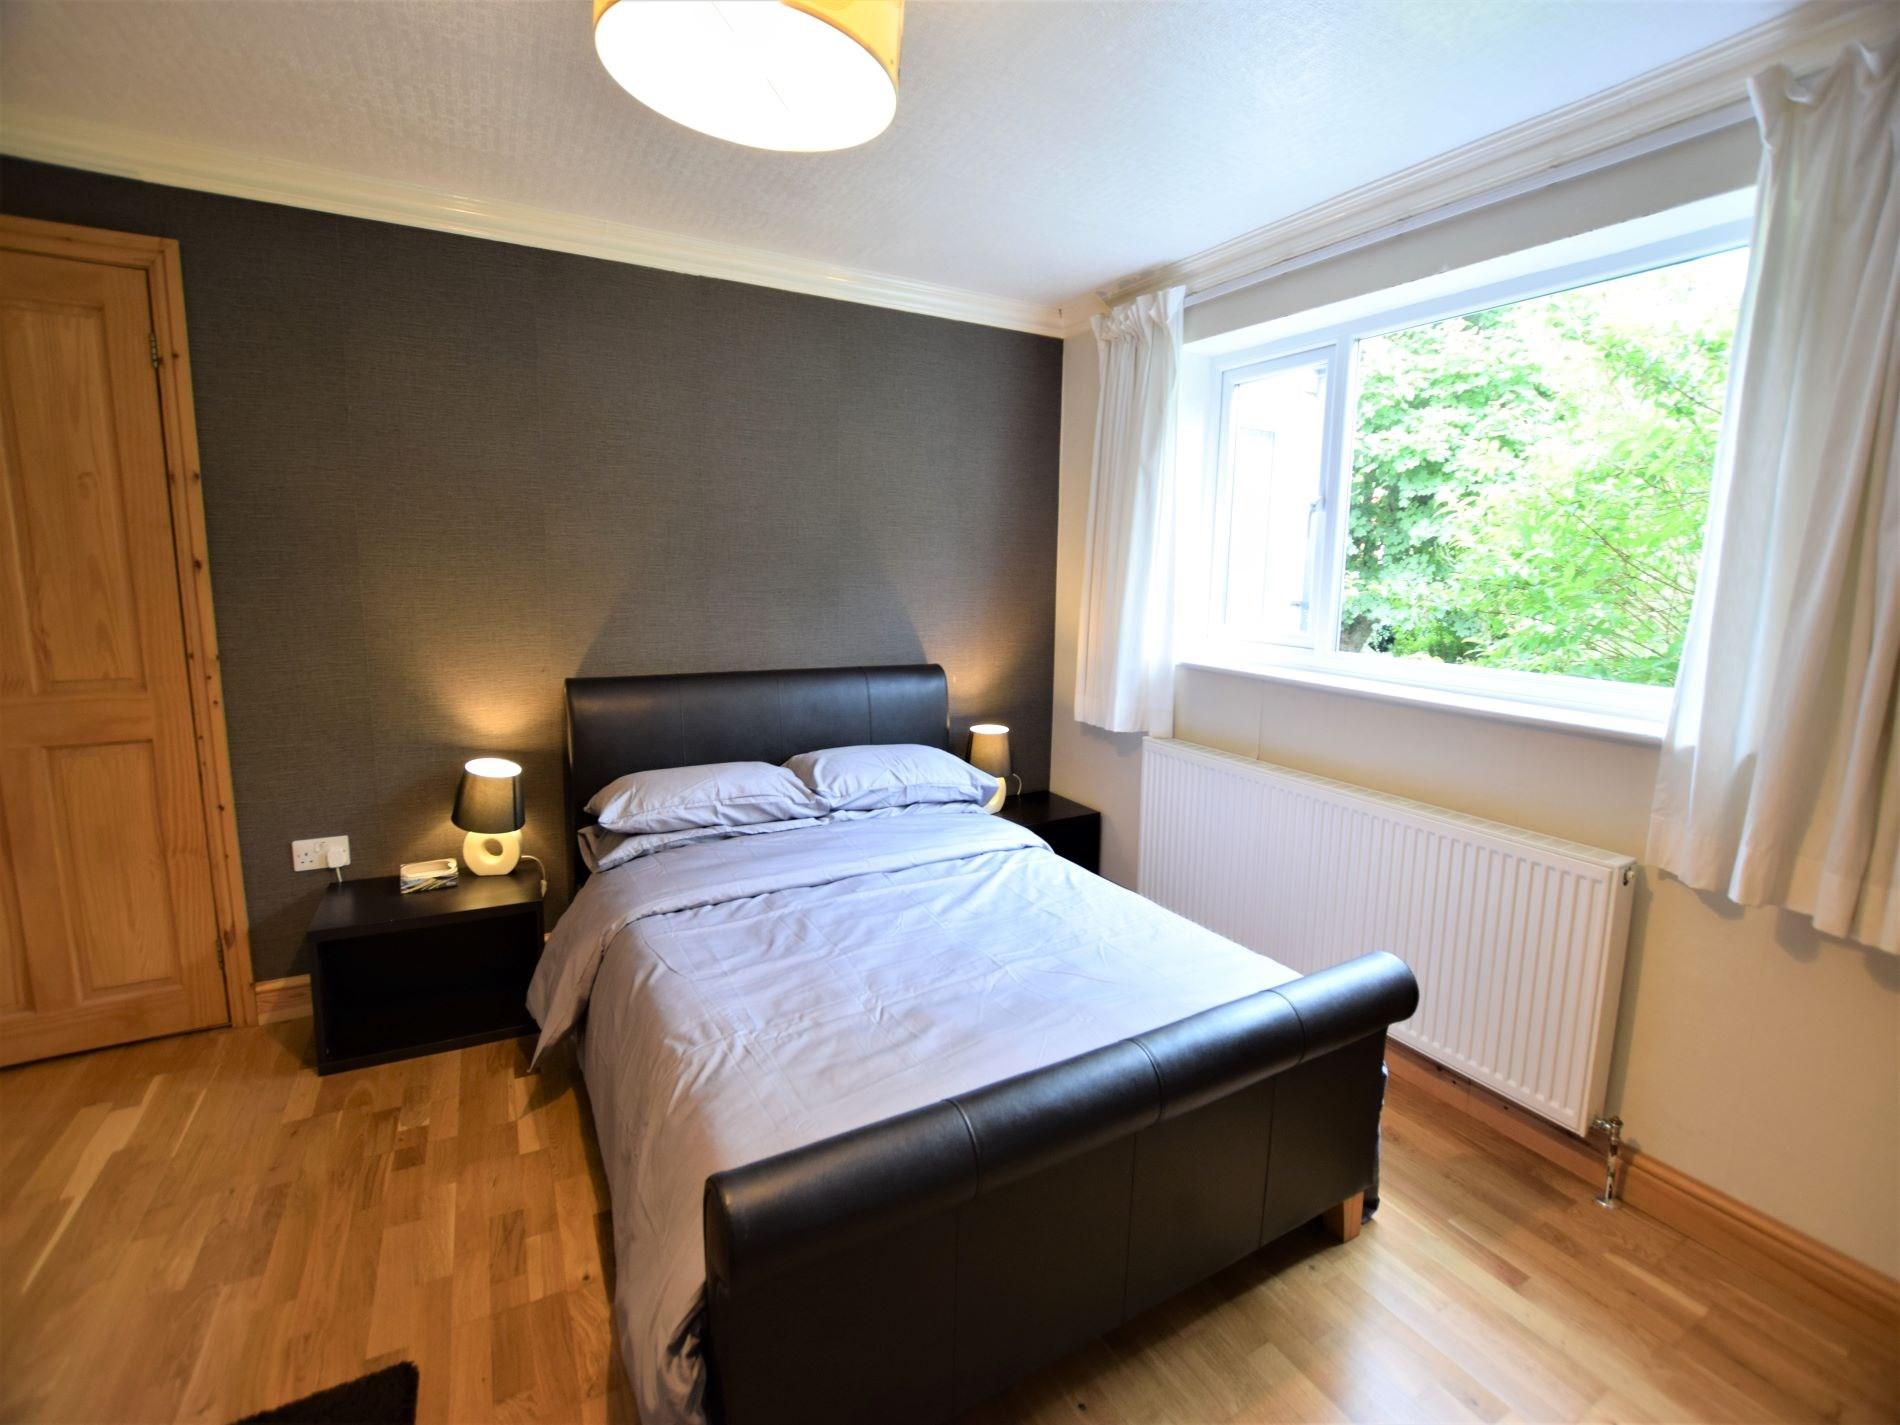 3 Bedroom Cottage in Sheffield, Yorkshire Dales